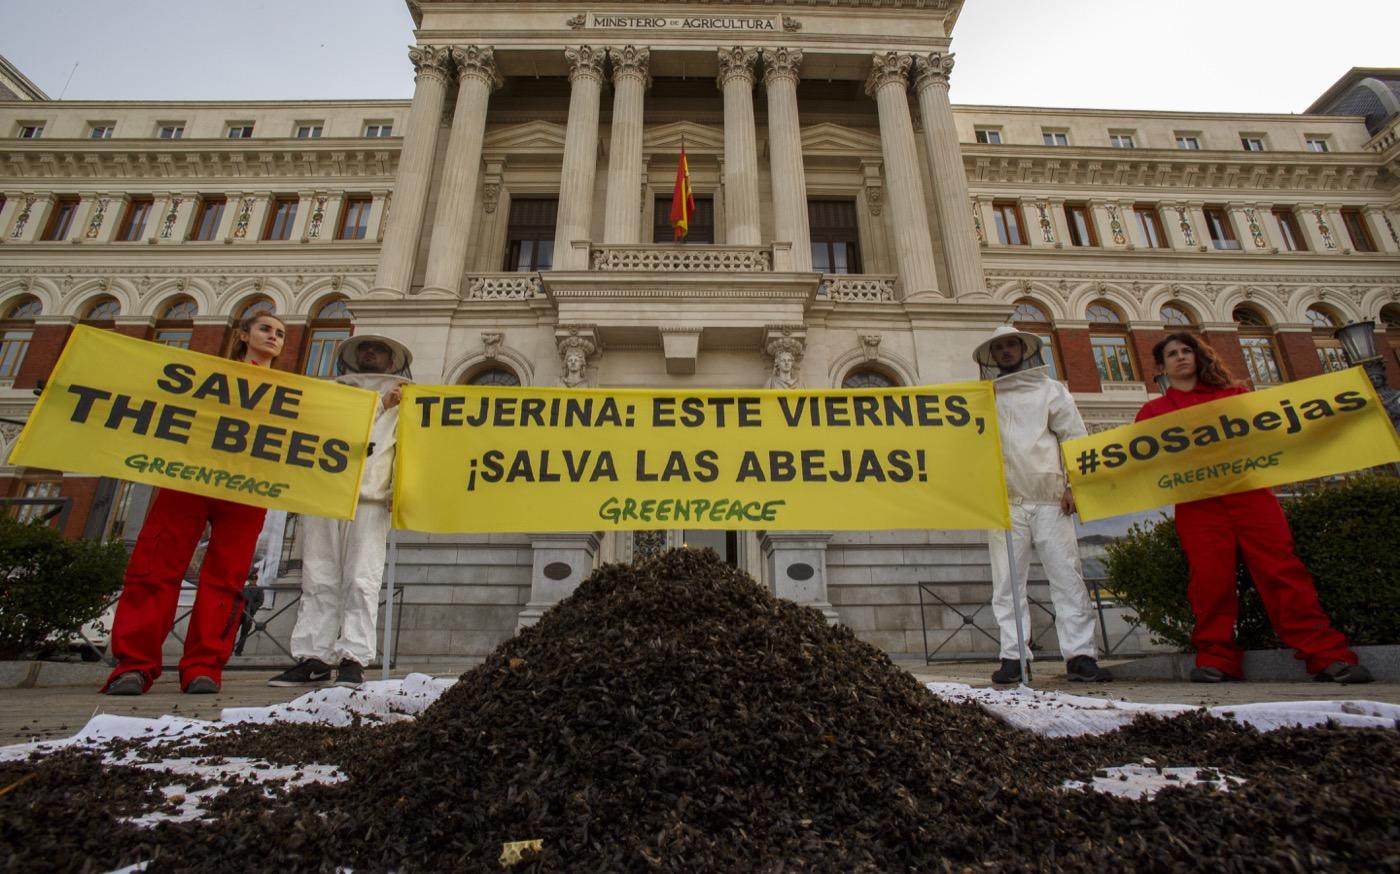 Foto cedida por Greenpeace España